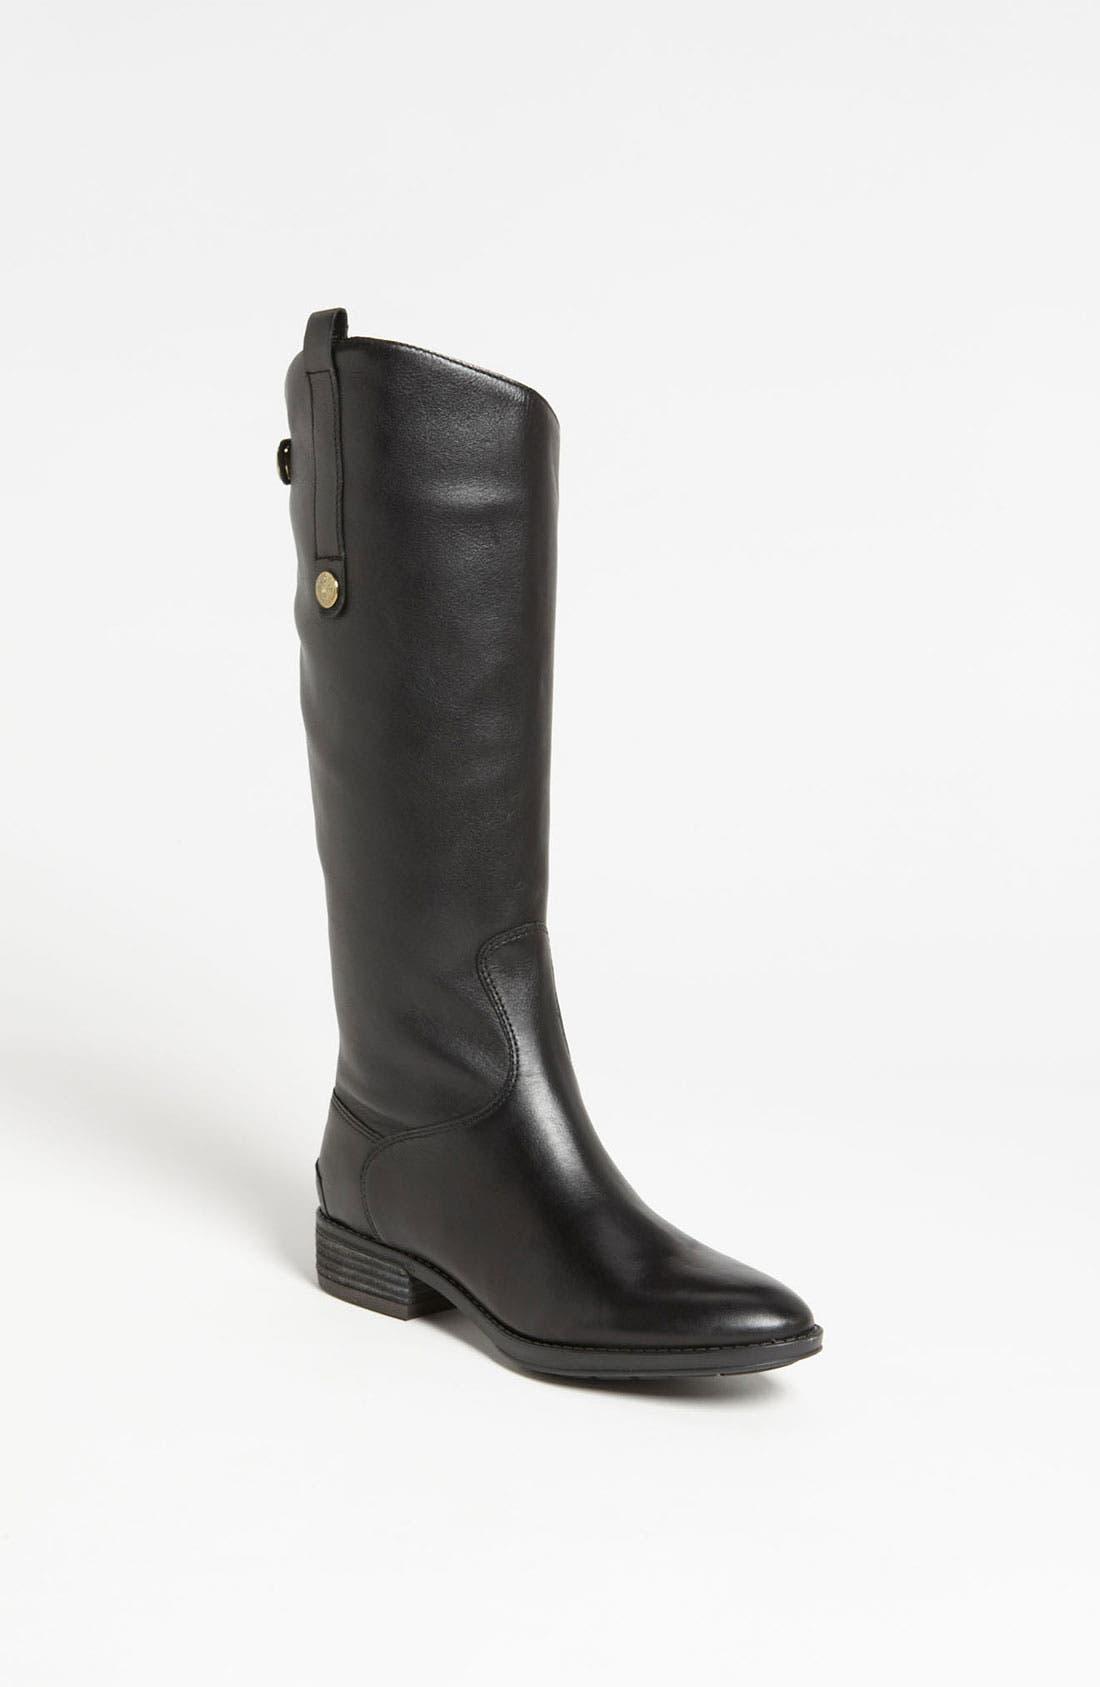 Alternate Image 1 Selected - Sam Edelman 'Penny' Boot (Women)